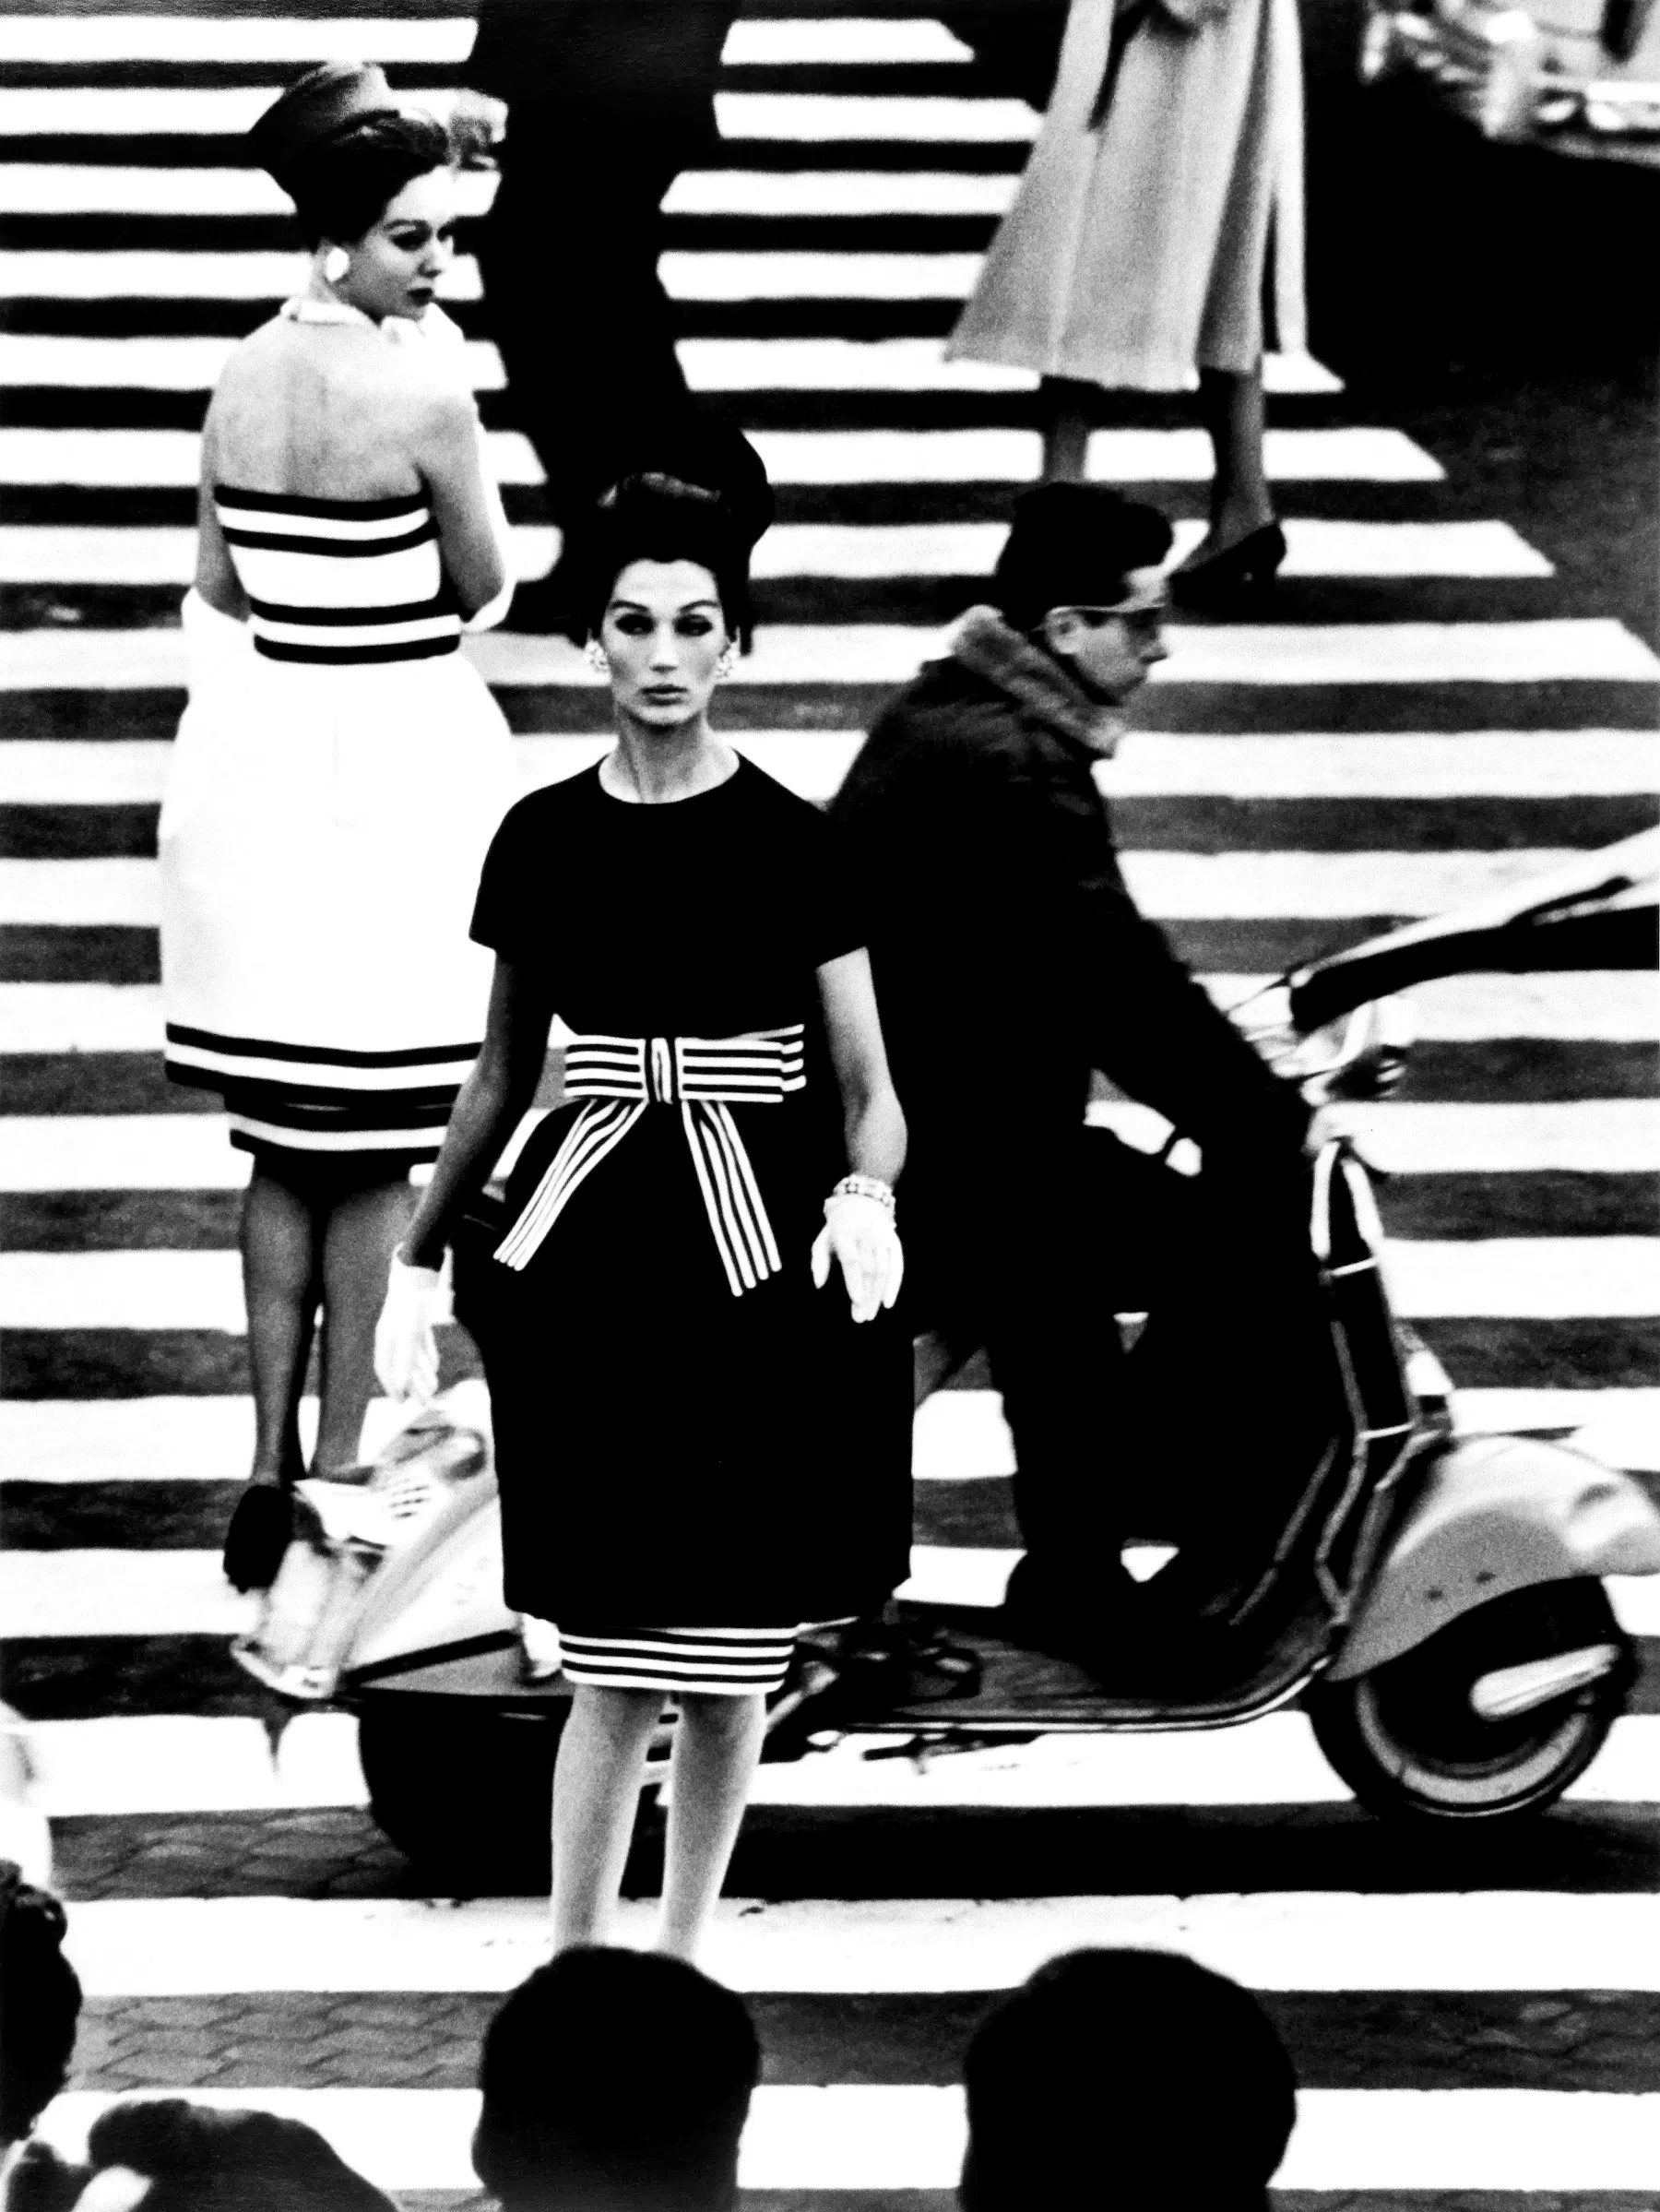 Simone and Nina, Piazza di Spagna